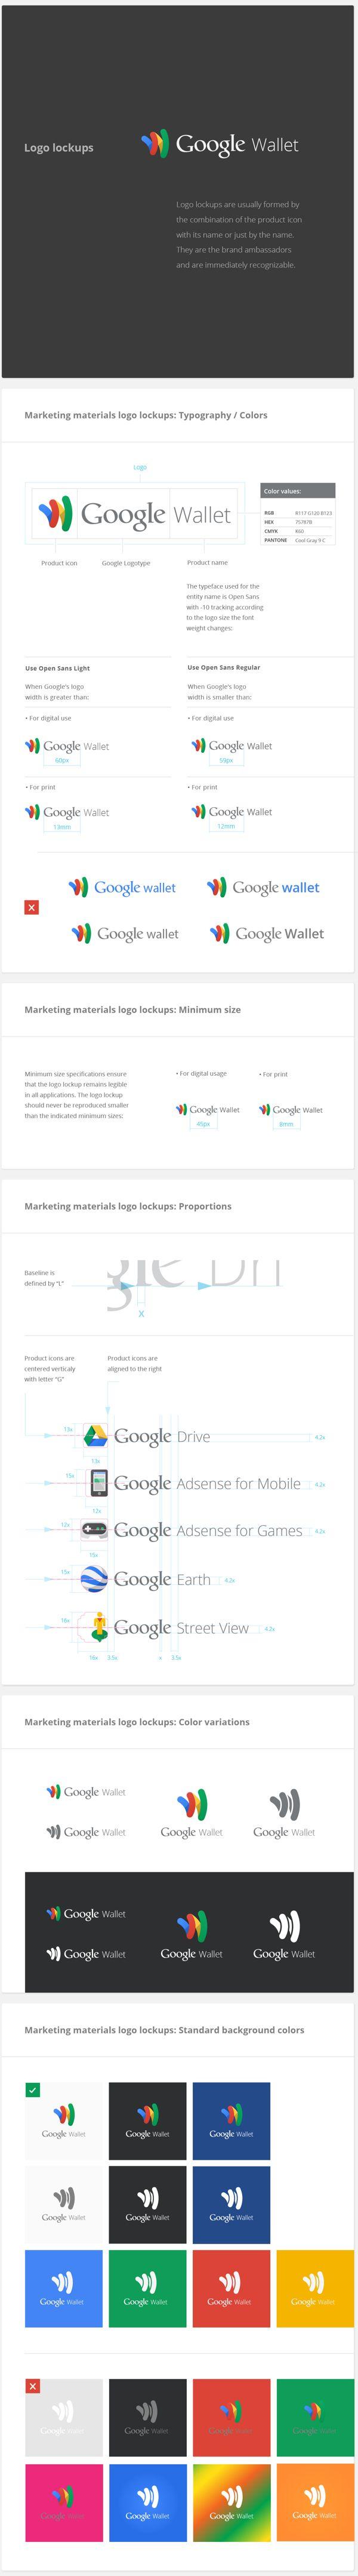 google visual identity guidelines 11